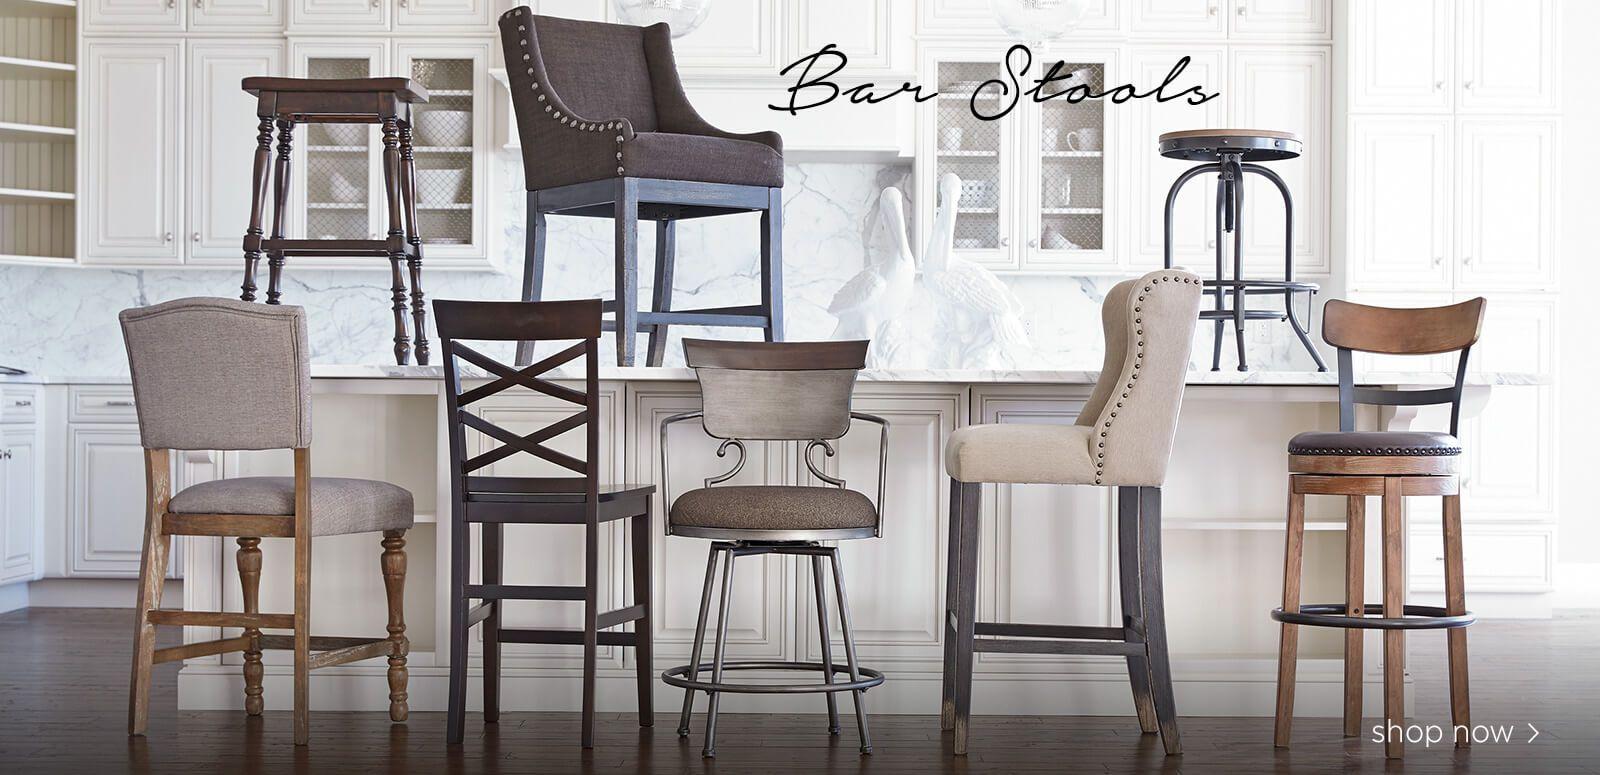 99 bar stools brick nj modern design furniture check more at http